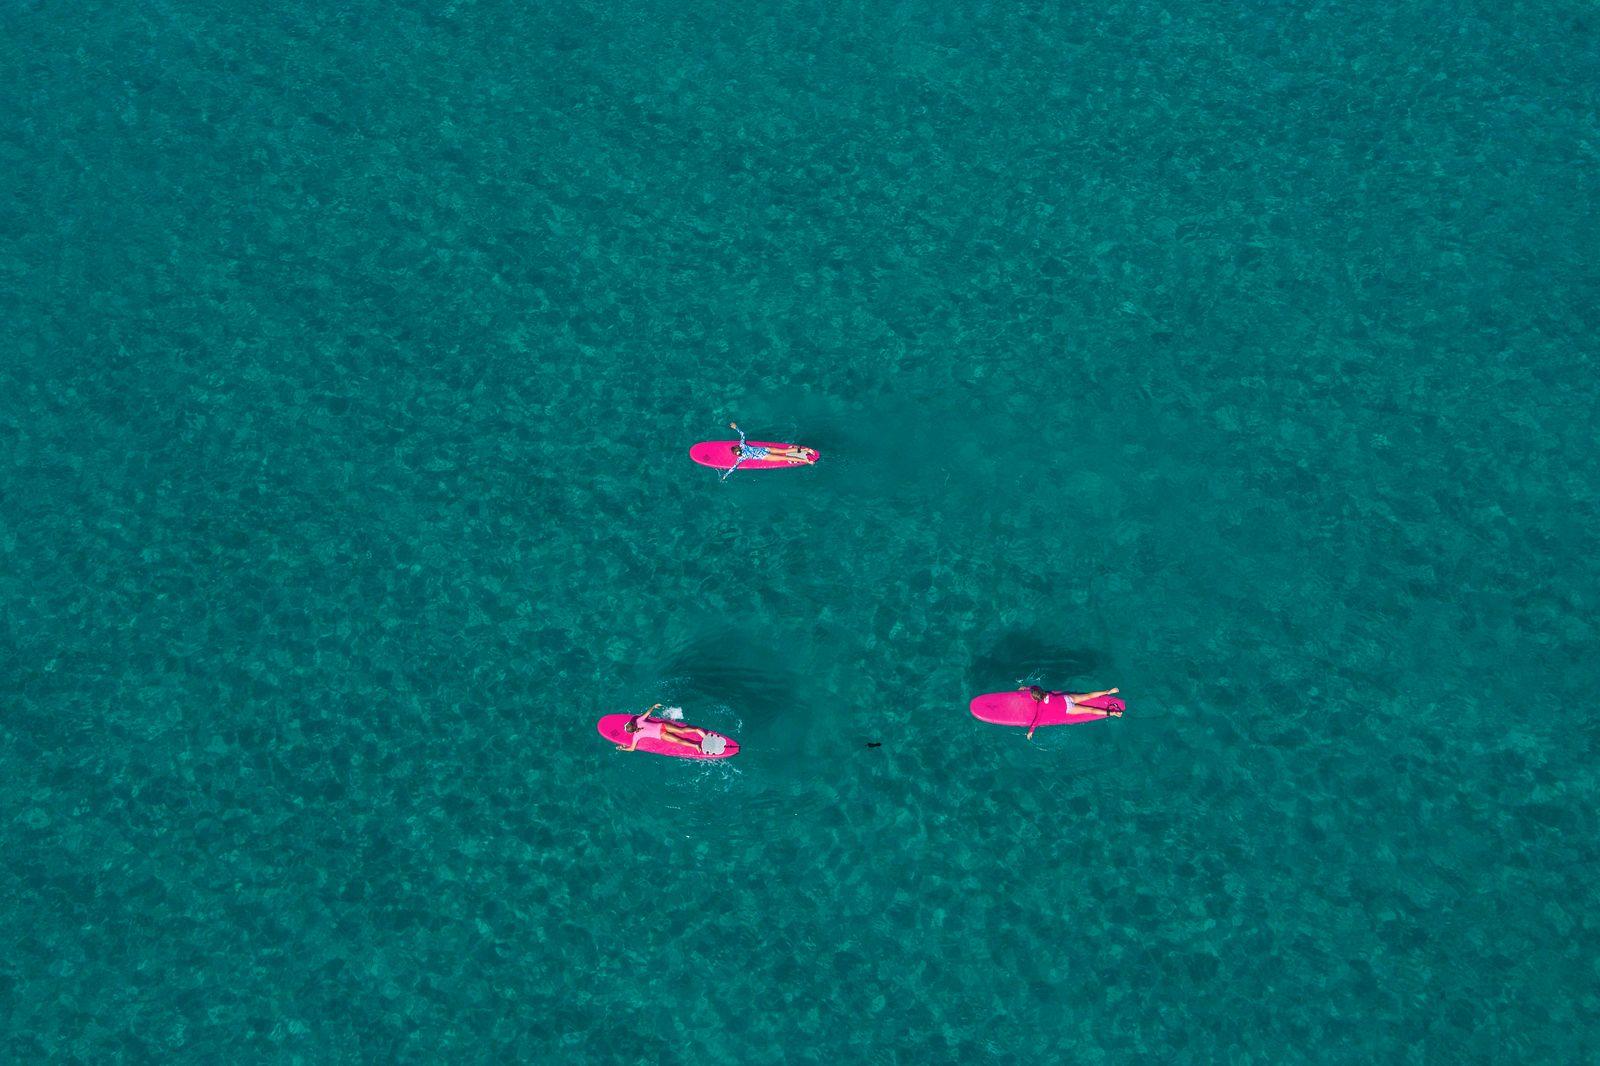 June 24, 2020, Jupiter, Florida, U.S: Kids float on their surfboards during the Blue Water School of Surfing Summer Cam